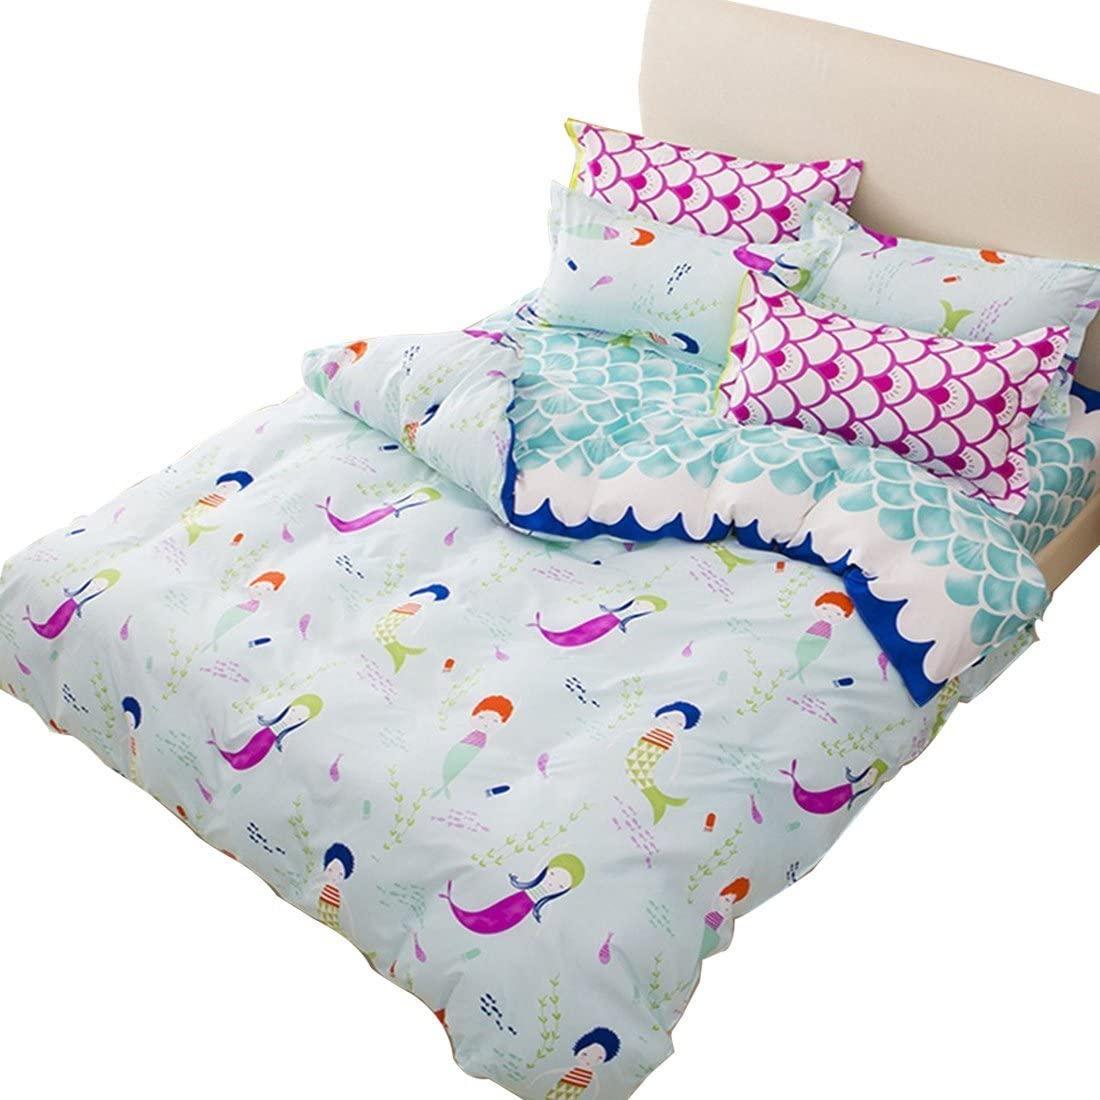 Sookie Duvet Cover Set with 2 Pillow Shams Blue Duvet Small mermaid Bedding - Twin